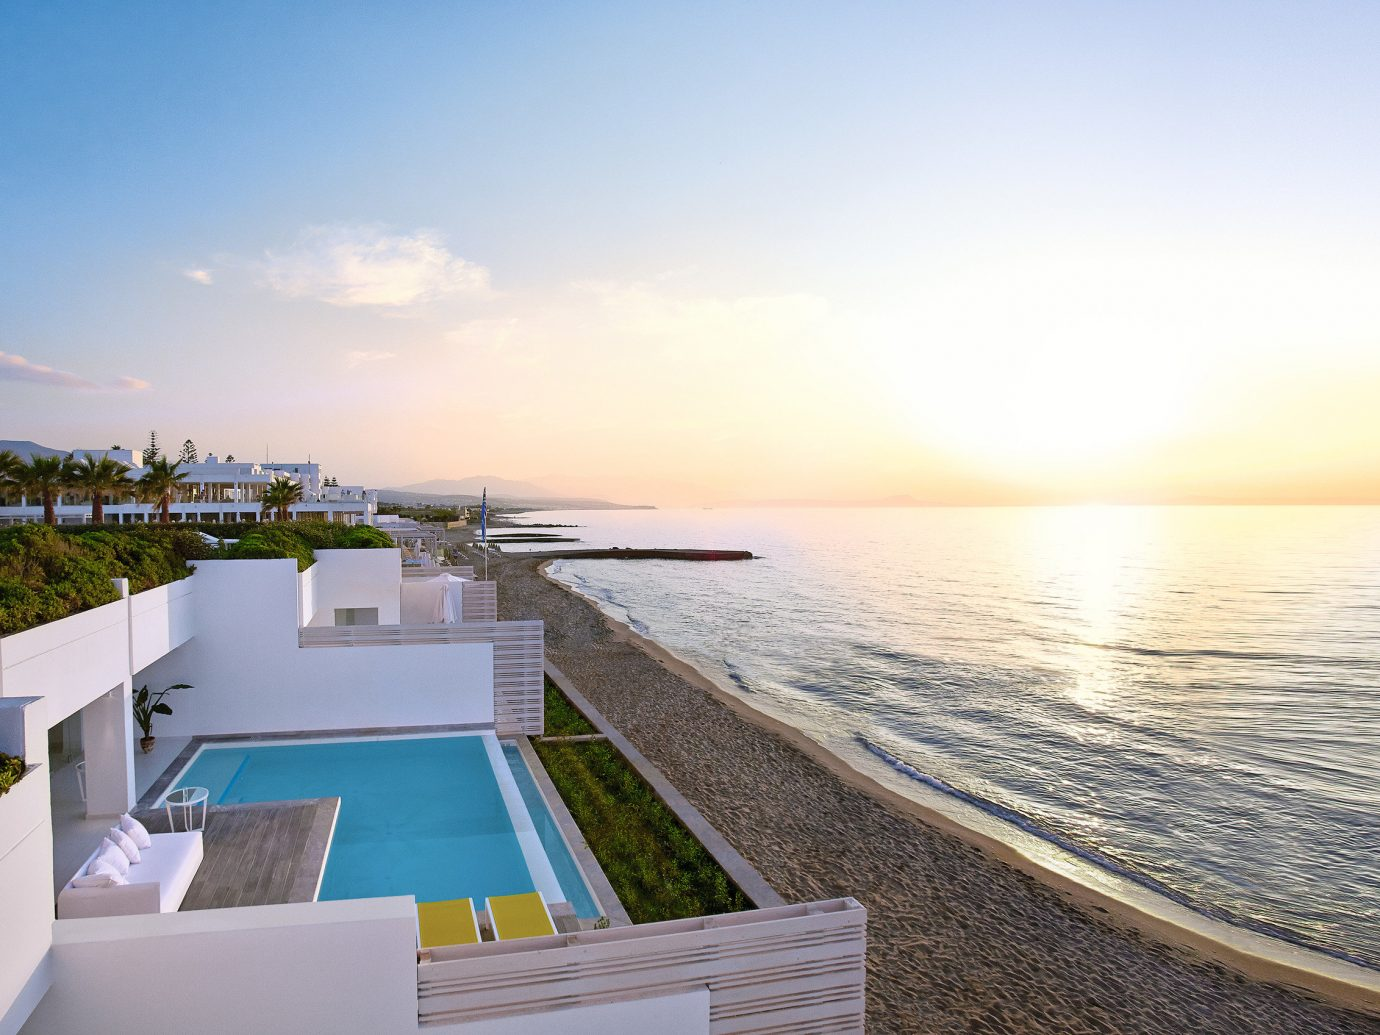 All-Inclusive Resorts Hotels sky outdoor water Sea property horizon real estate Resort Ocean vacation swimming pool leisure condominium estate house apartment Villa shore